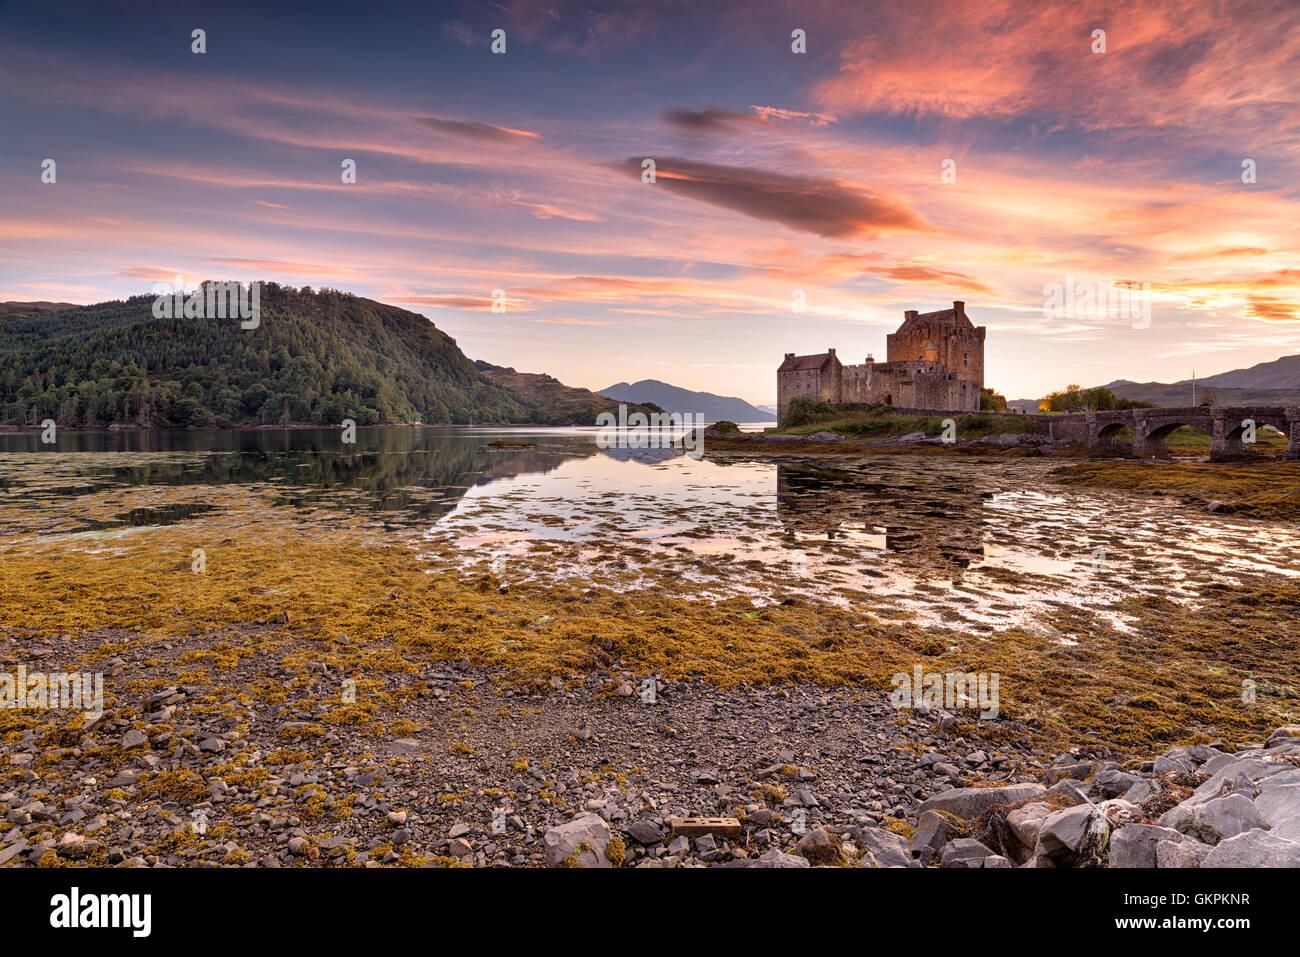 Stunning evening sky over Eilean Donan castle on the western coast of the Scottsih highlands - Stock Image